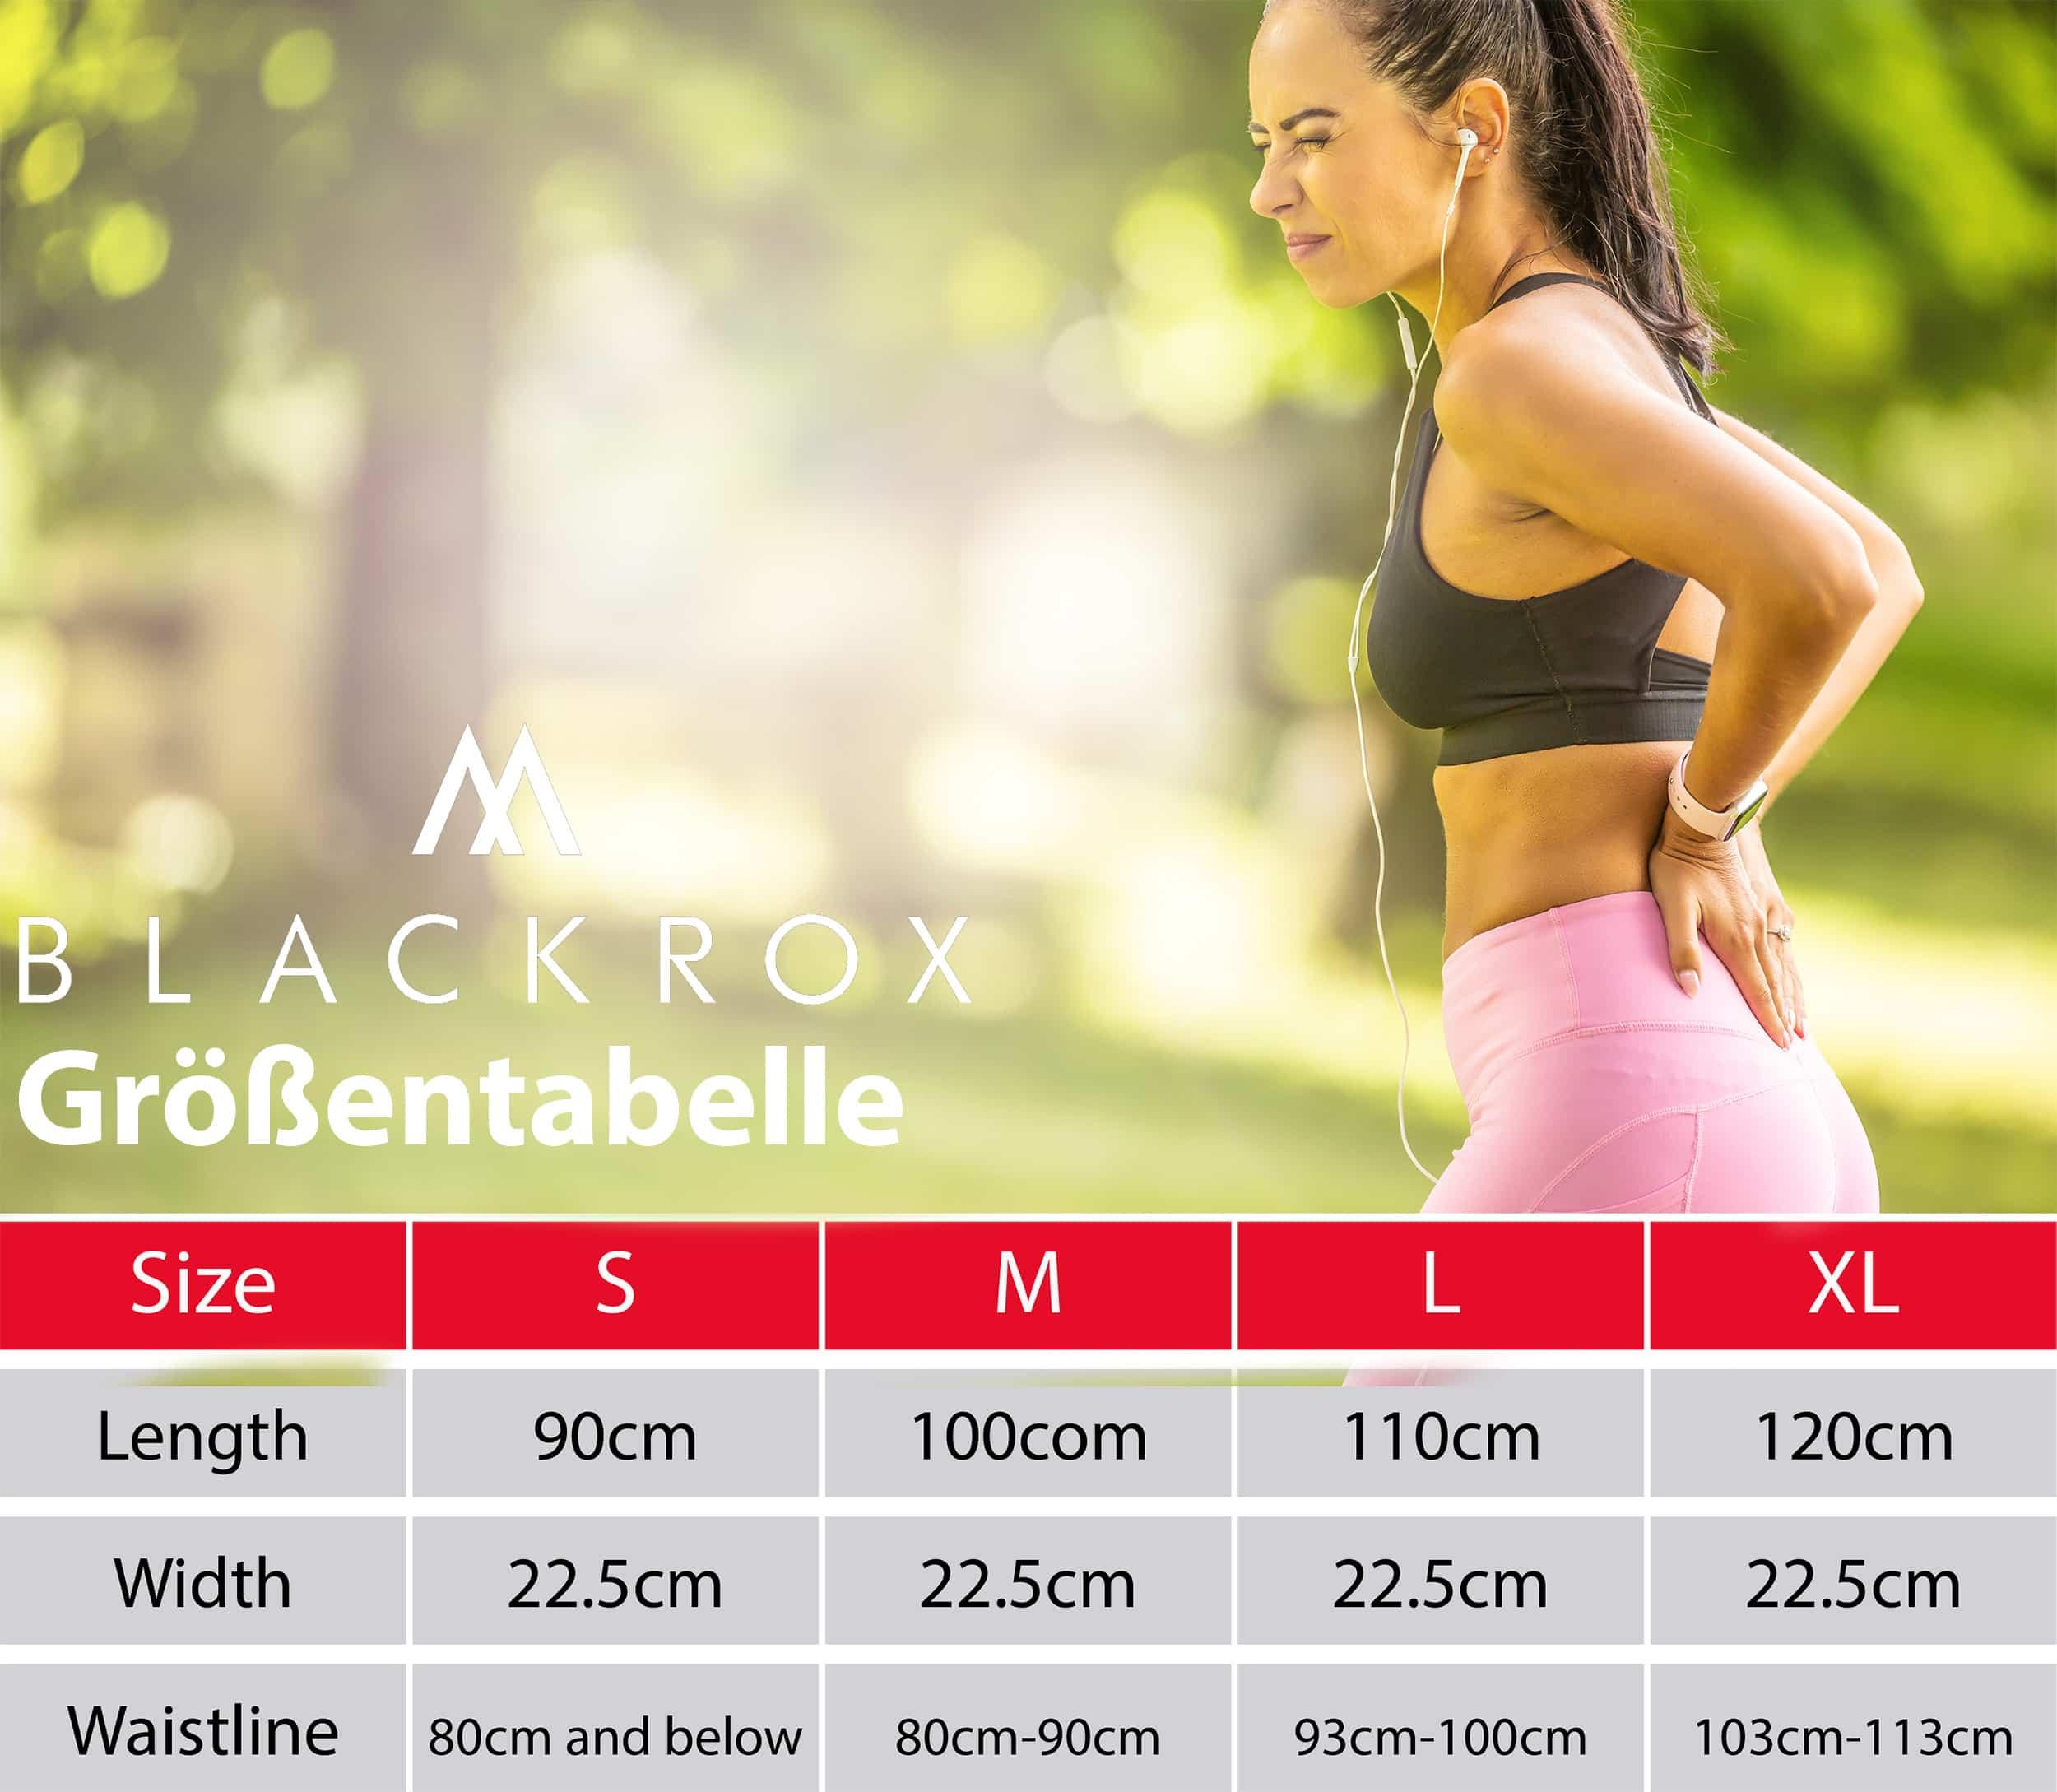 Blackrox-Lendenwirbelstütz-gürtel (13)